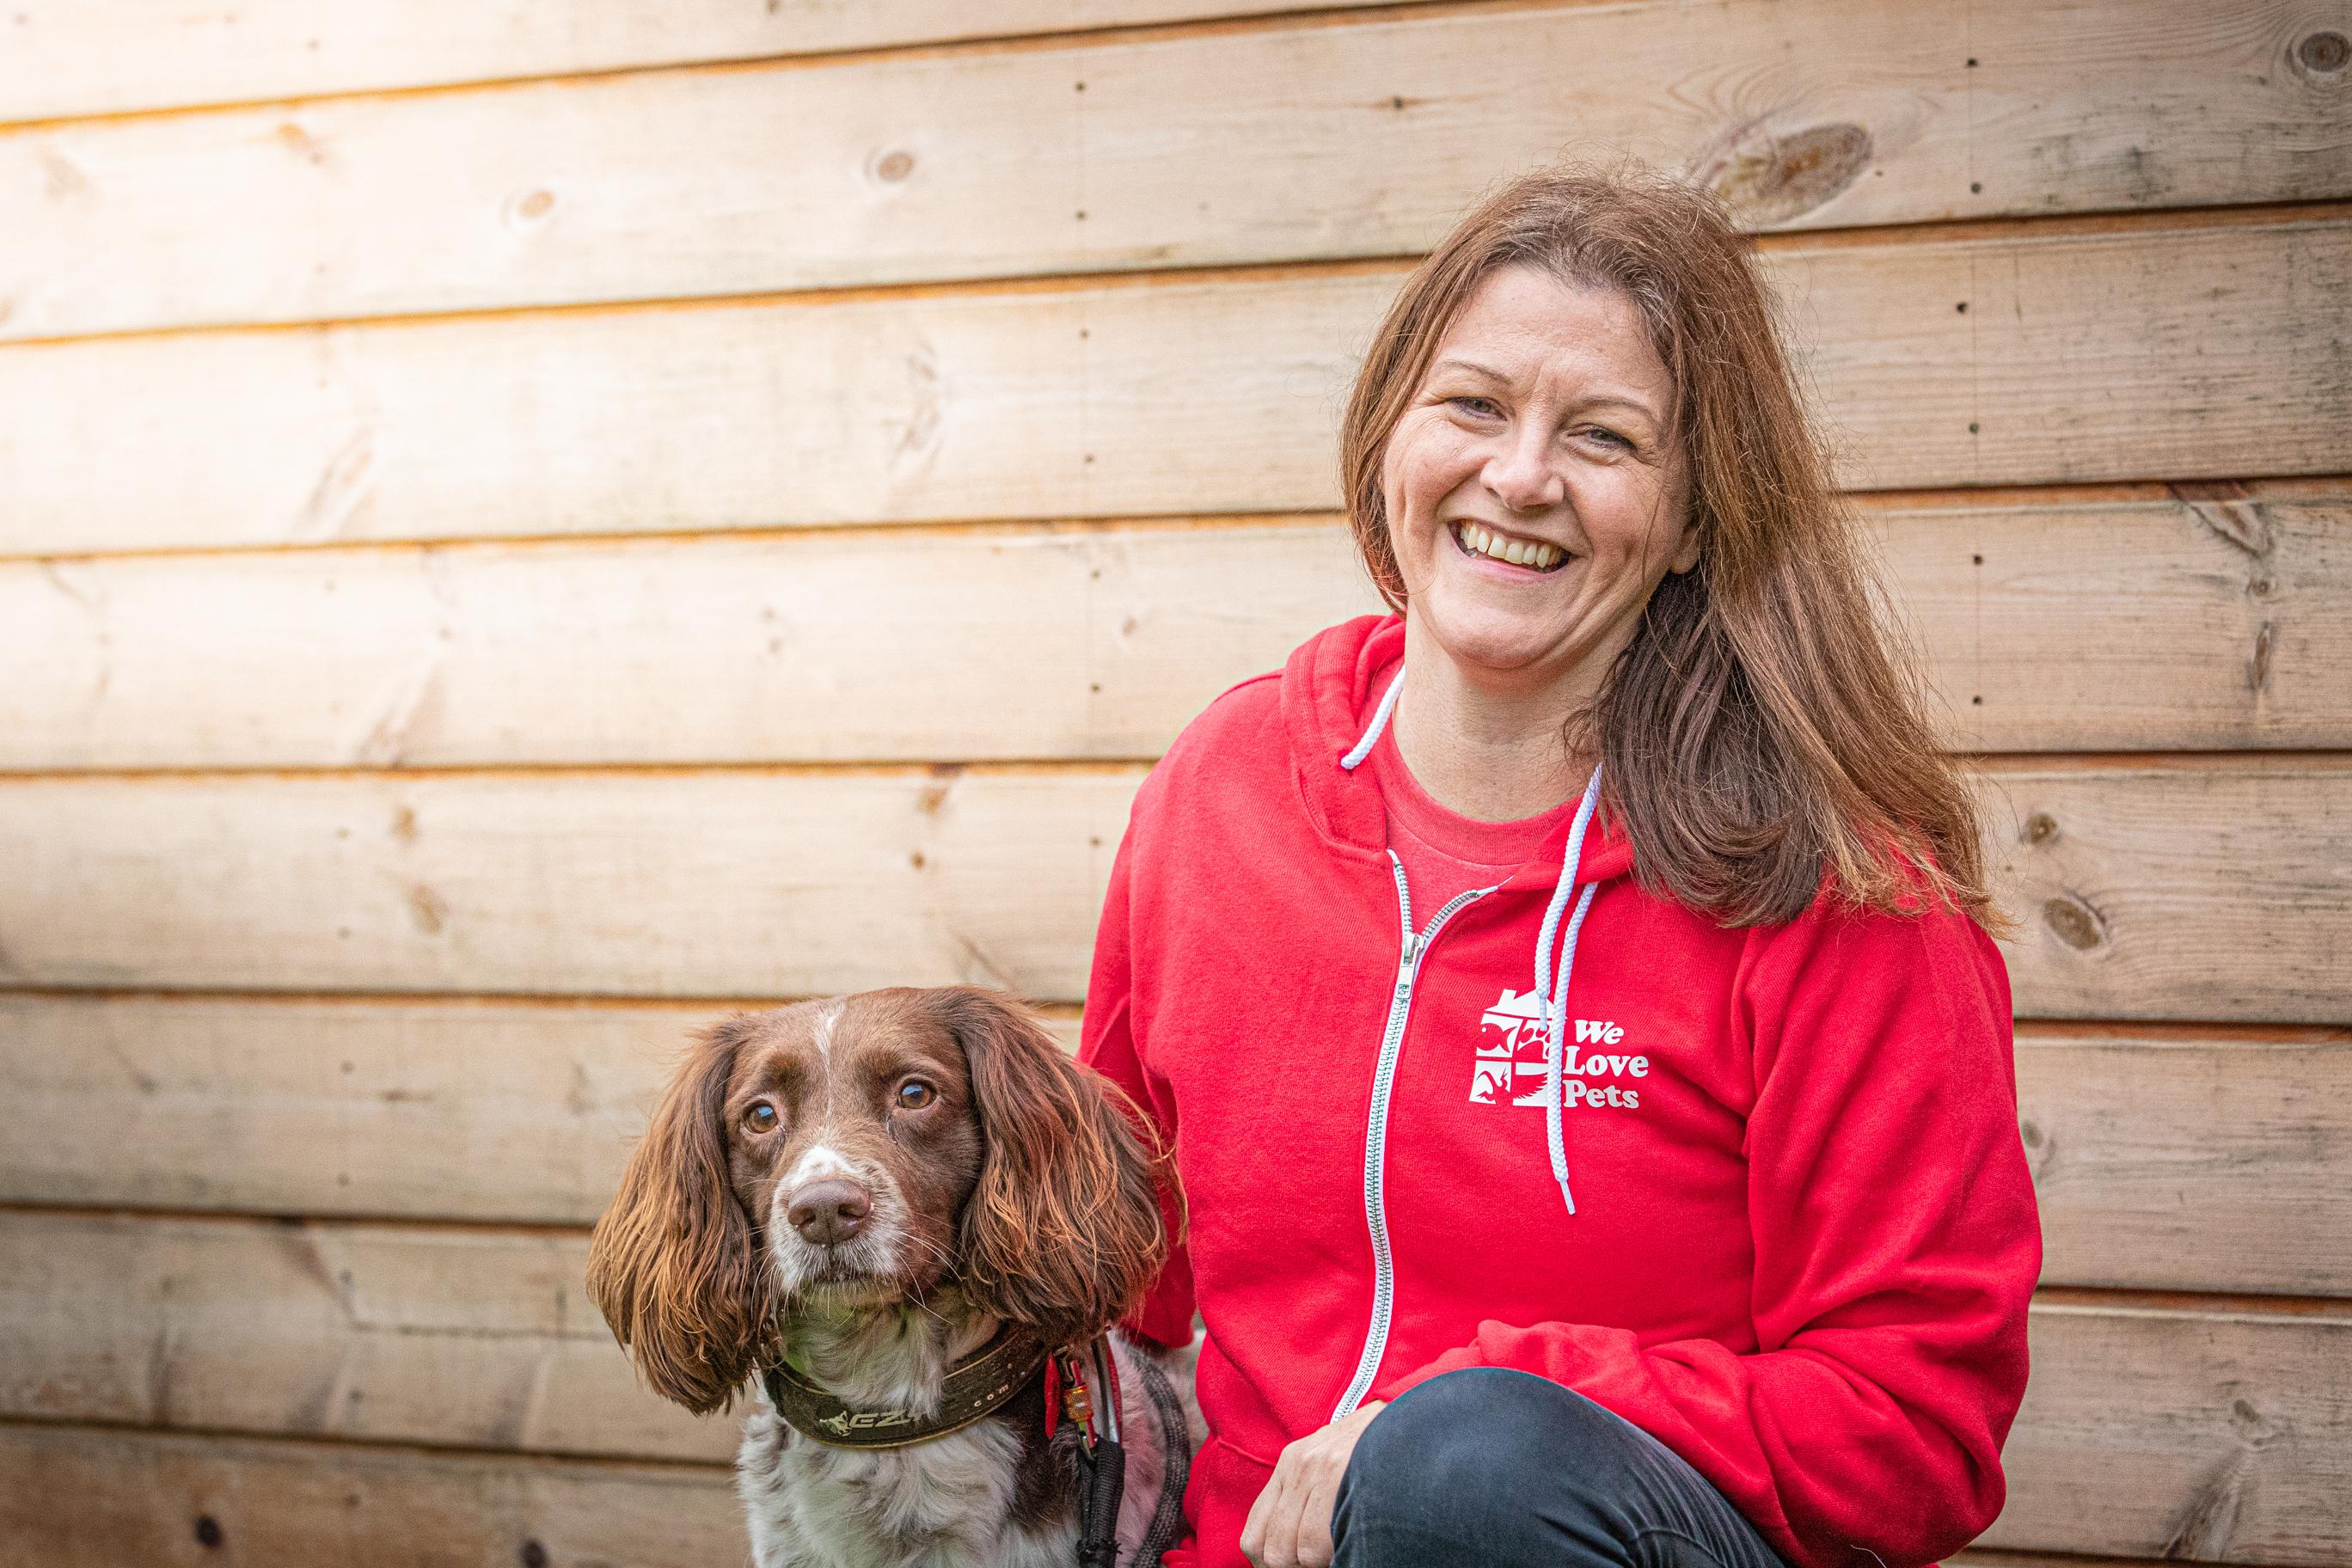 Julie Marshall - We Love Pets Bolton